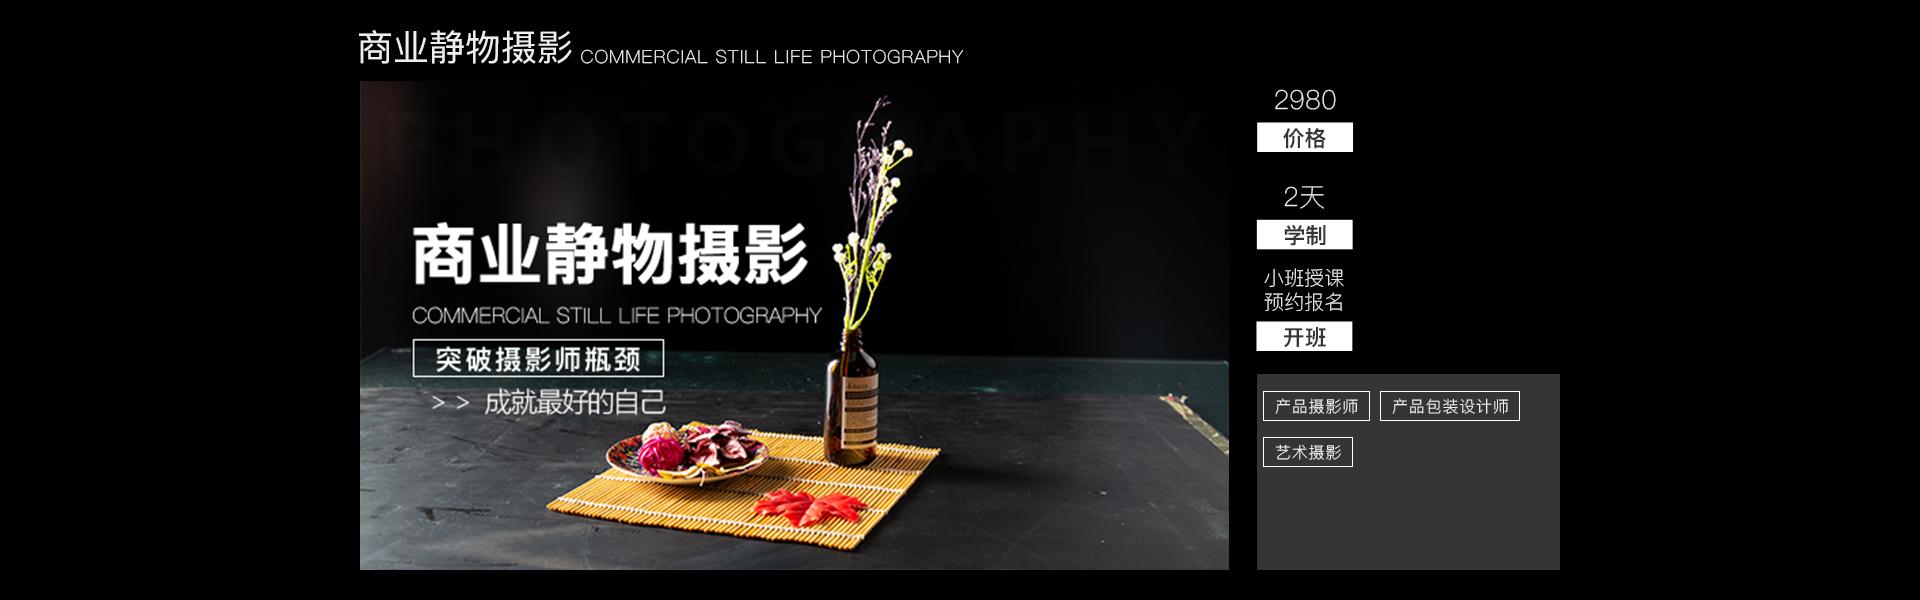 商業靜物攝影banner